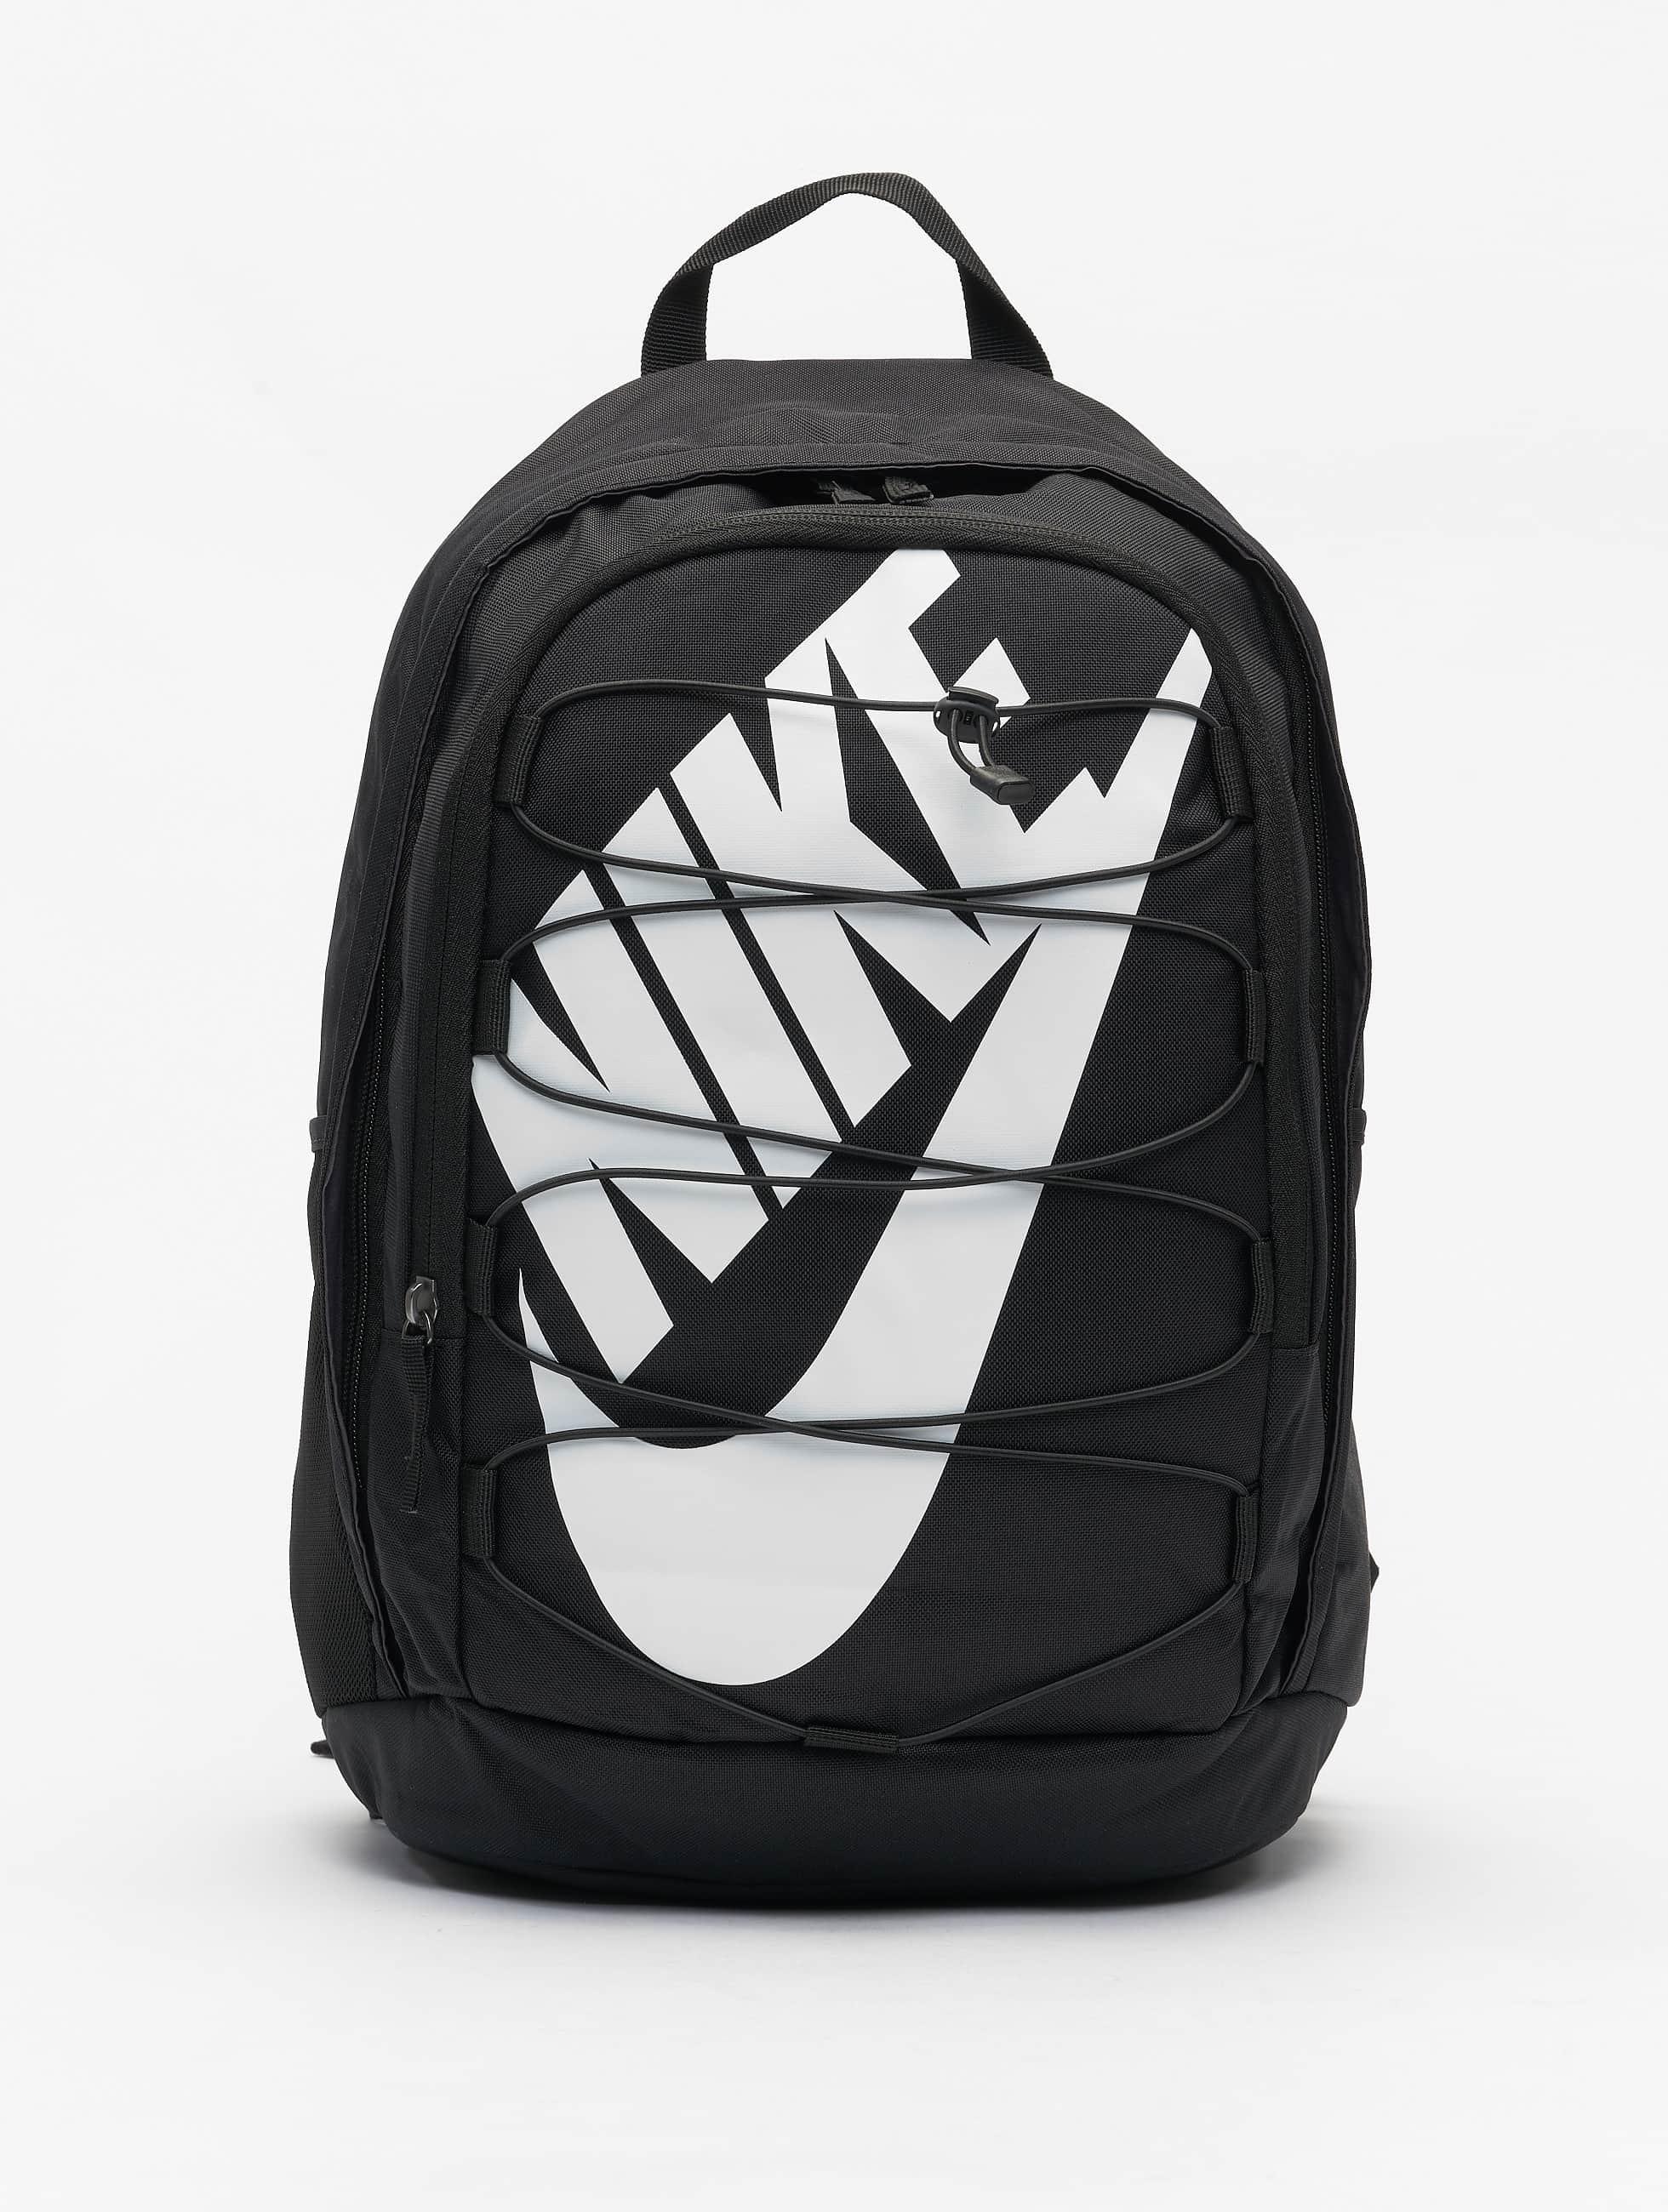 Nike Hayward 2.0 Backpack BlackBlackWhite